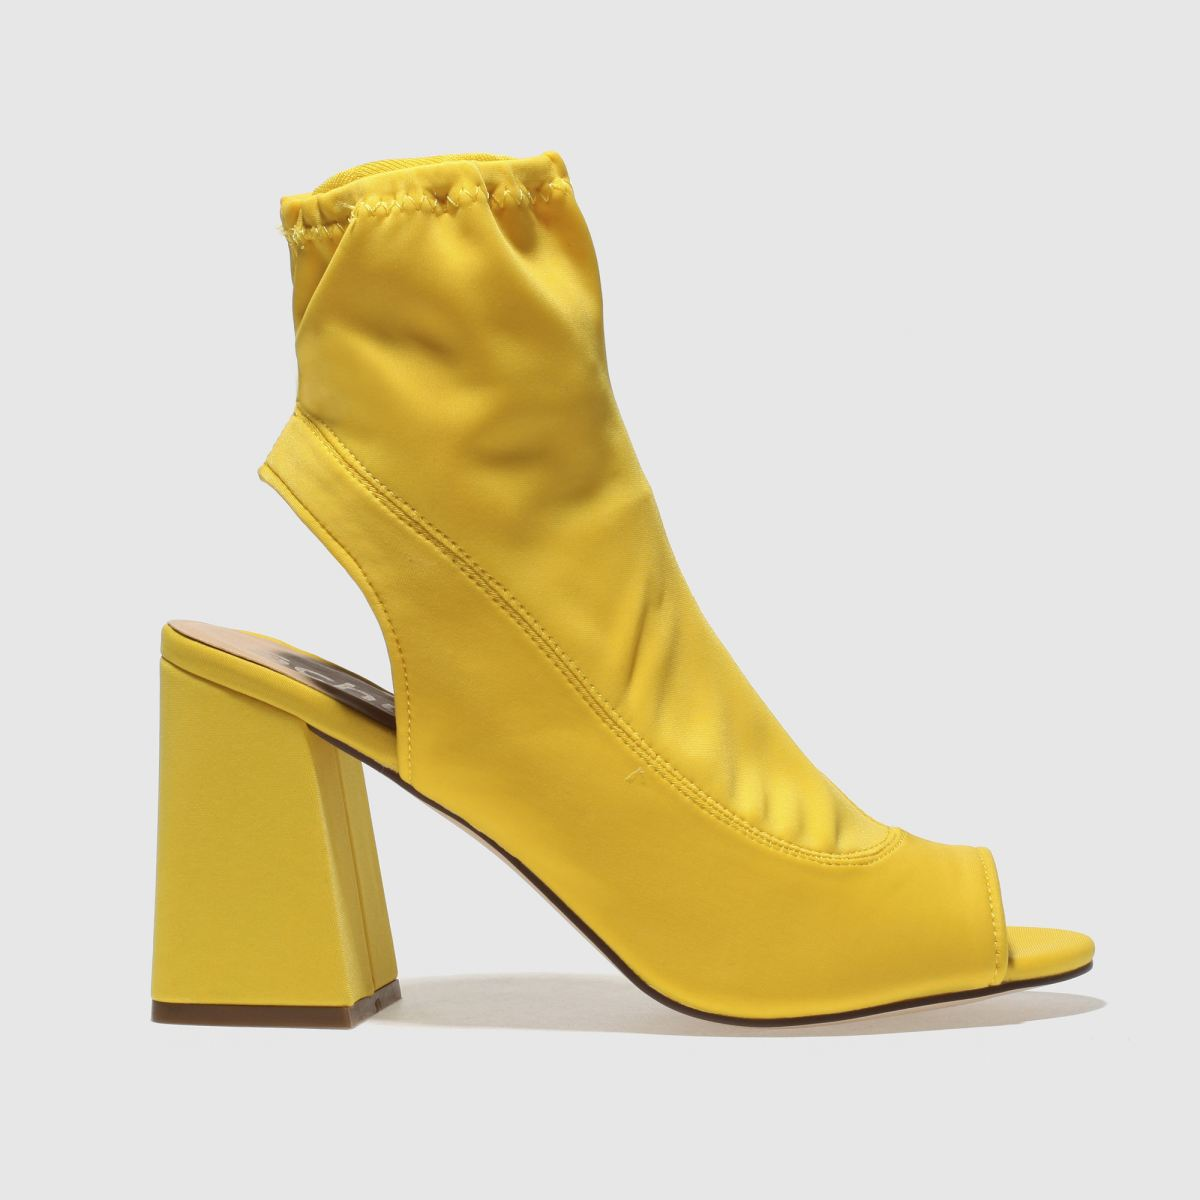 Schuh Yellow Swish Boots